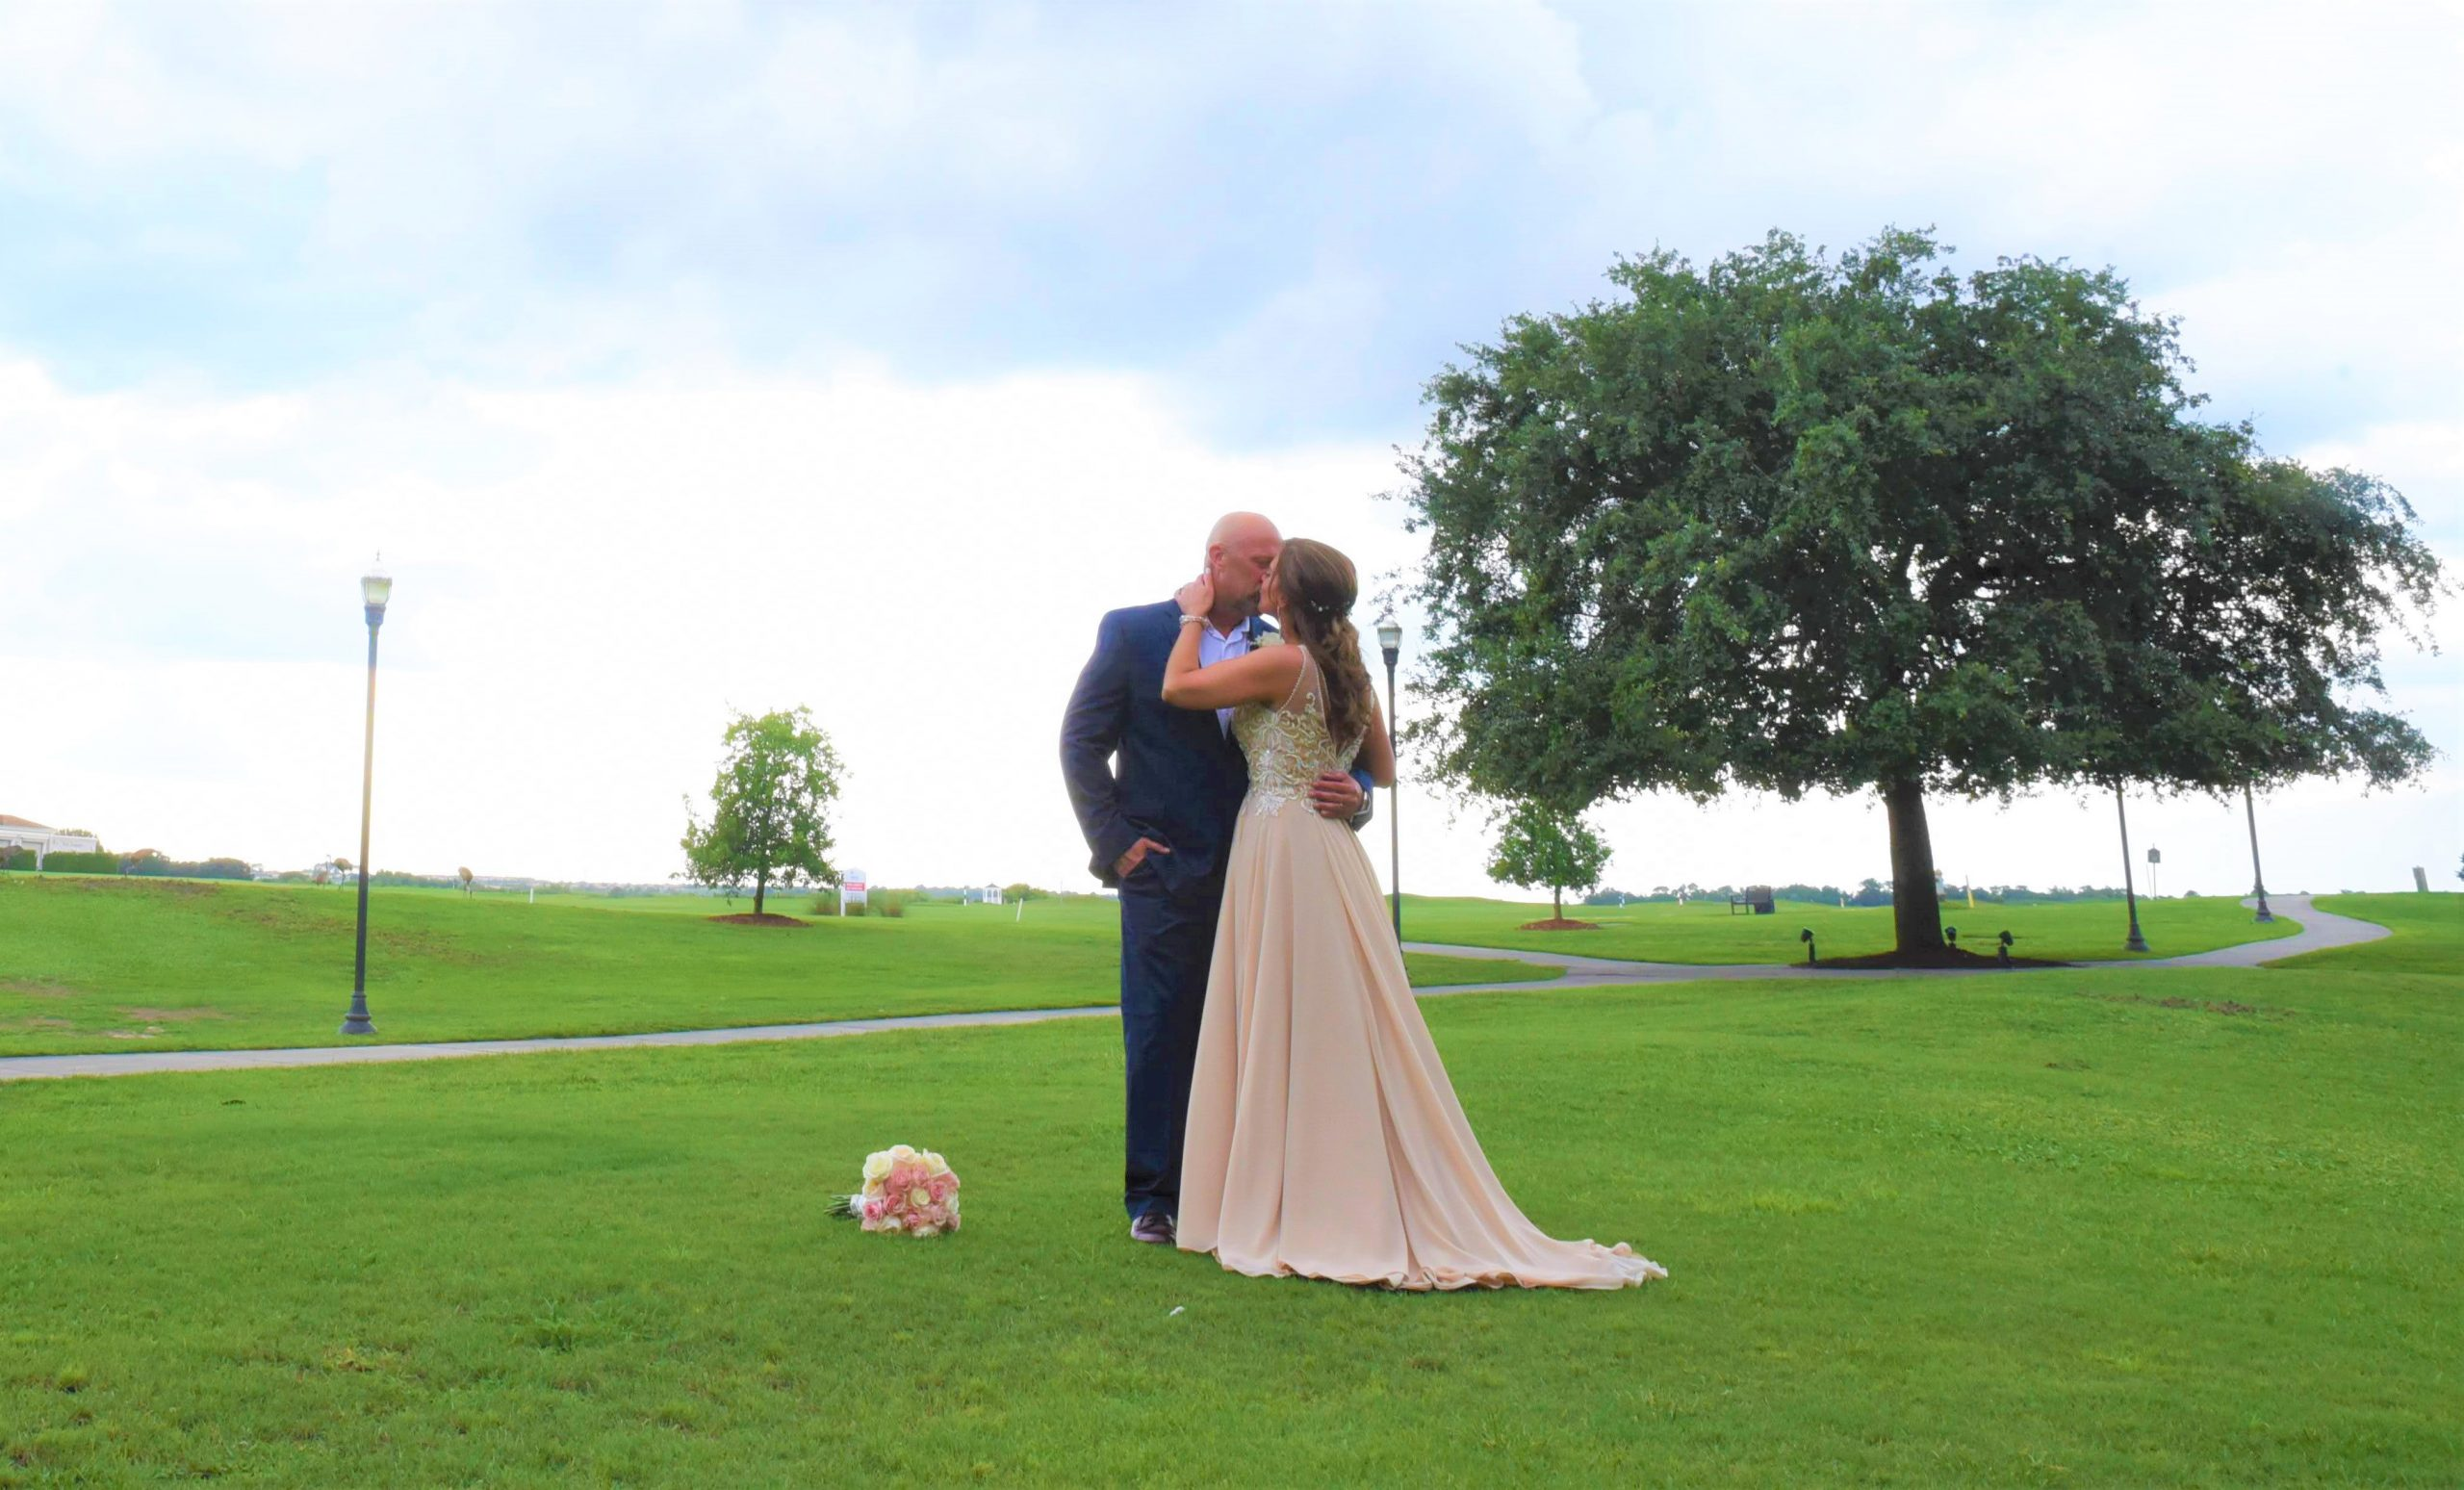 Florida Micro Wedding | Melanie and John at the Omni Orlando Resort